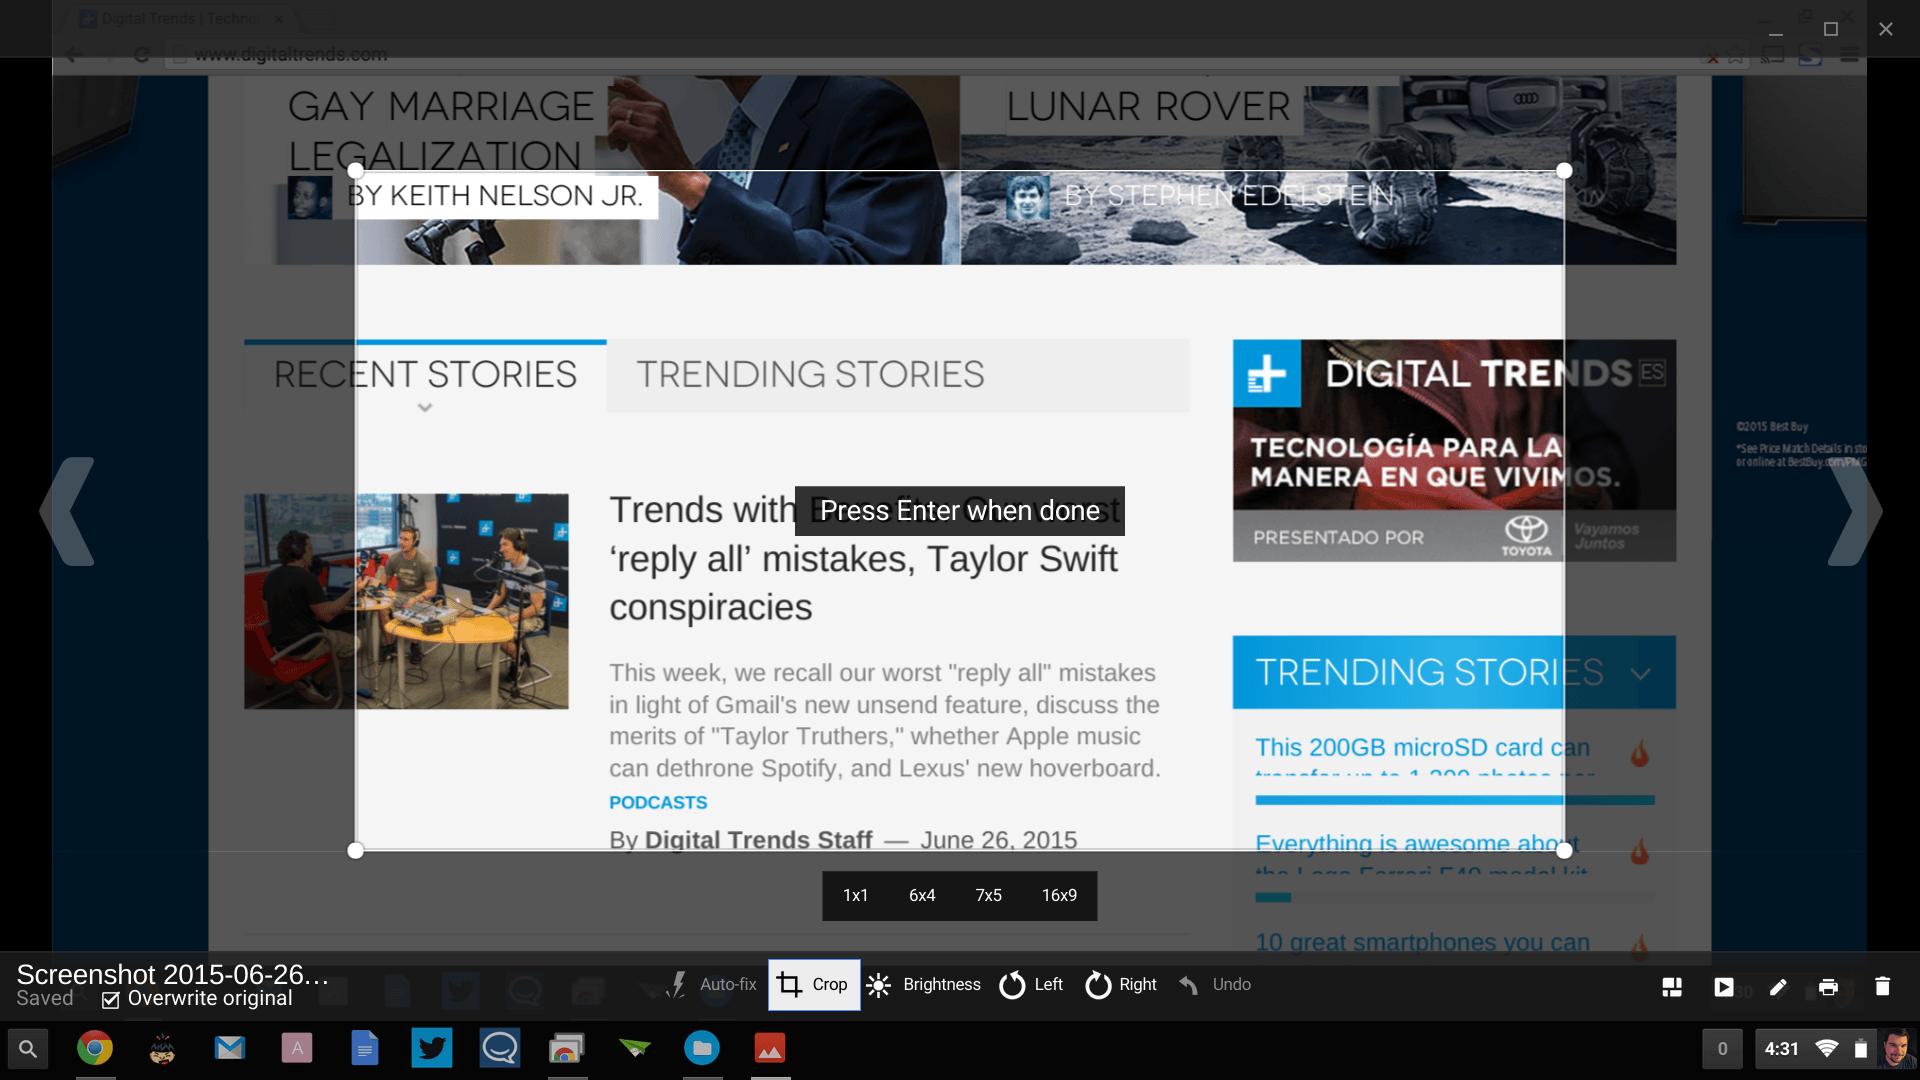 How To Take A Screenshot On A Chromebook Digital Trends Digital Trends Chromebook Digital